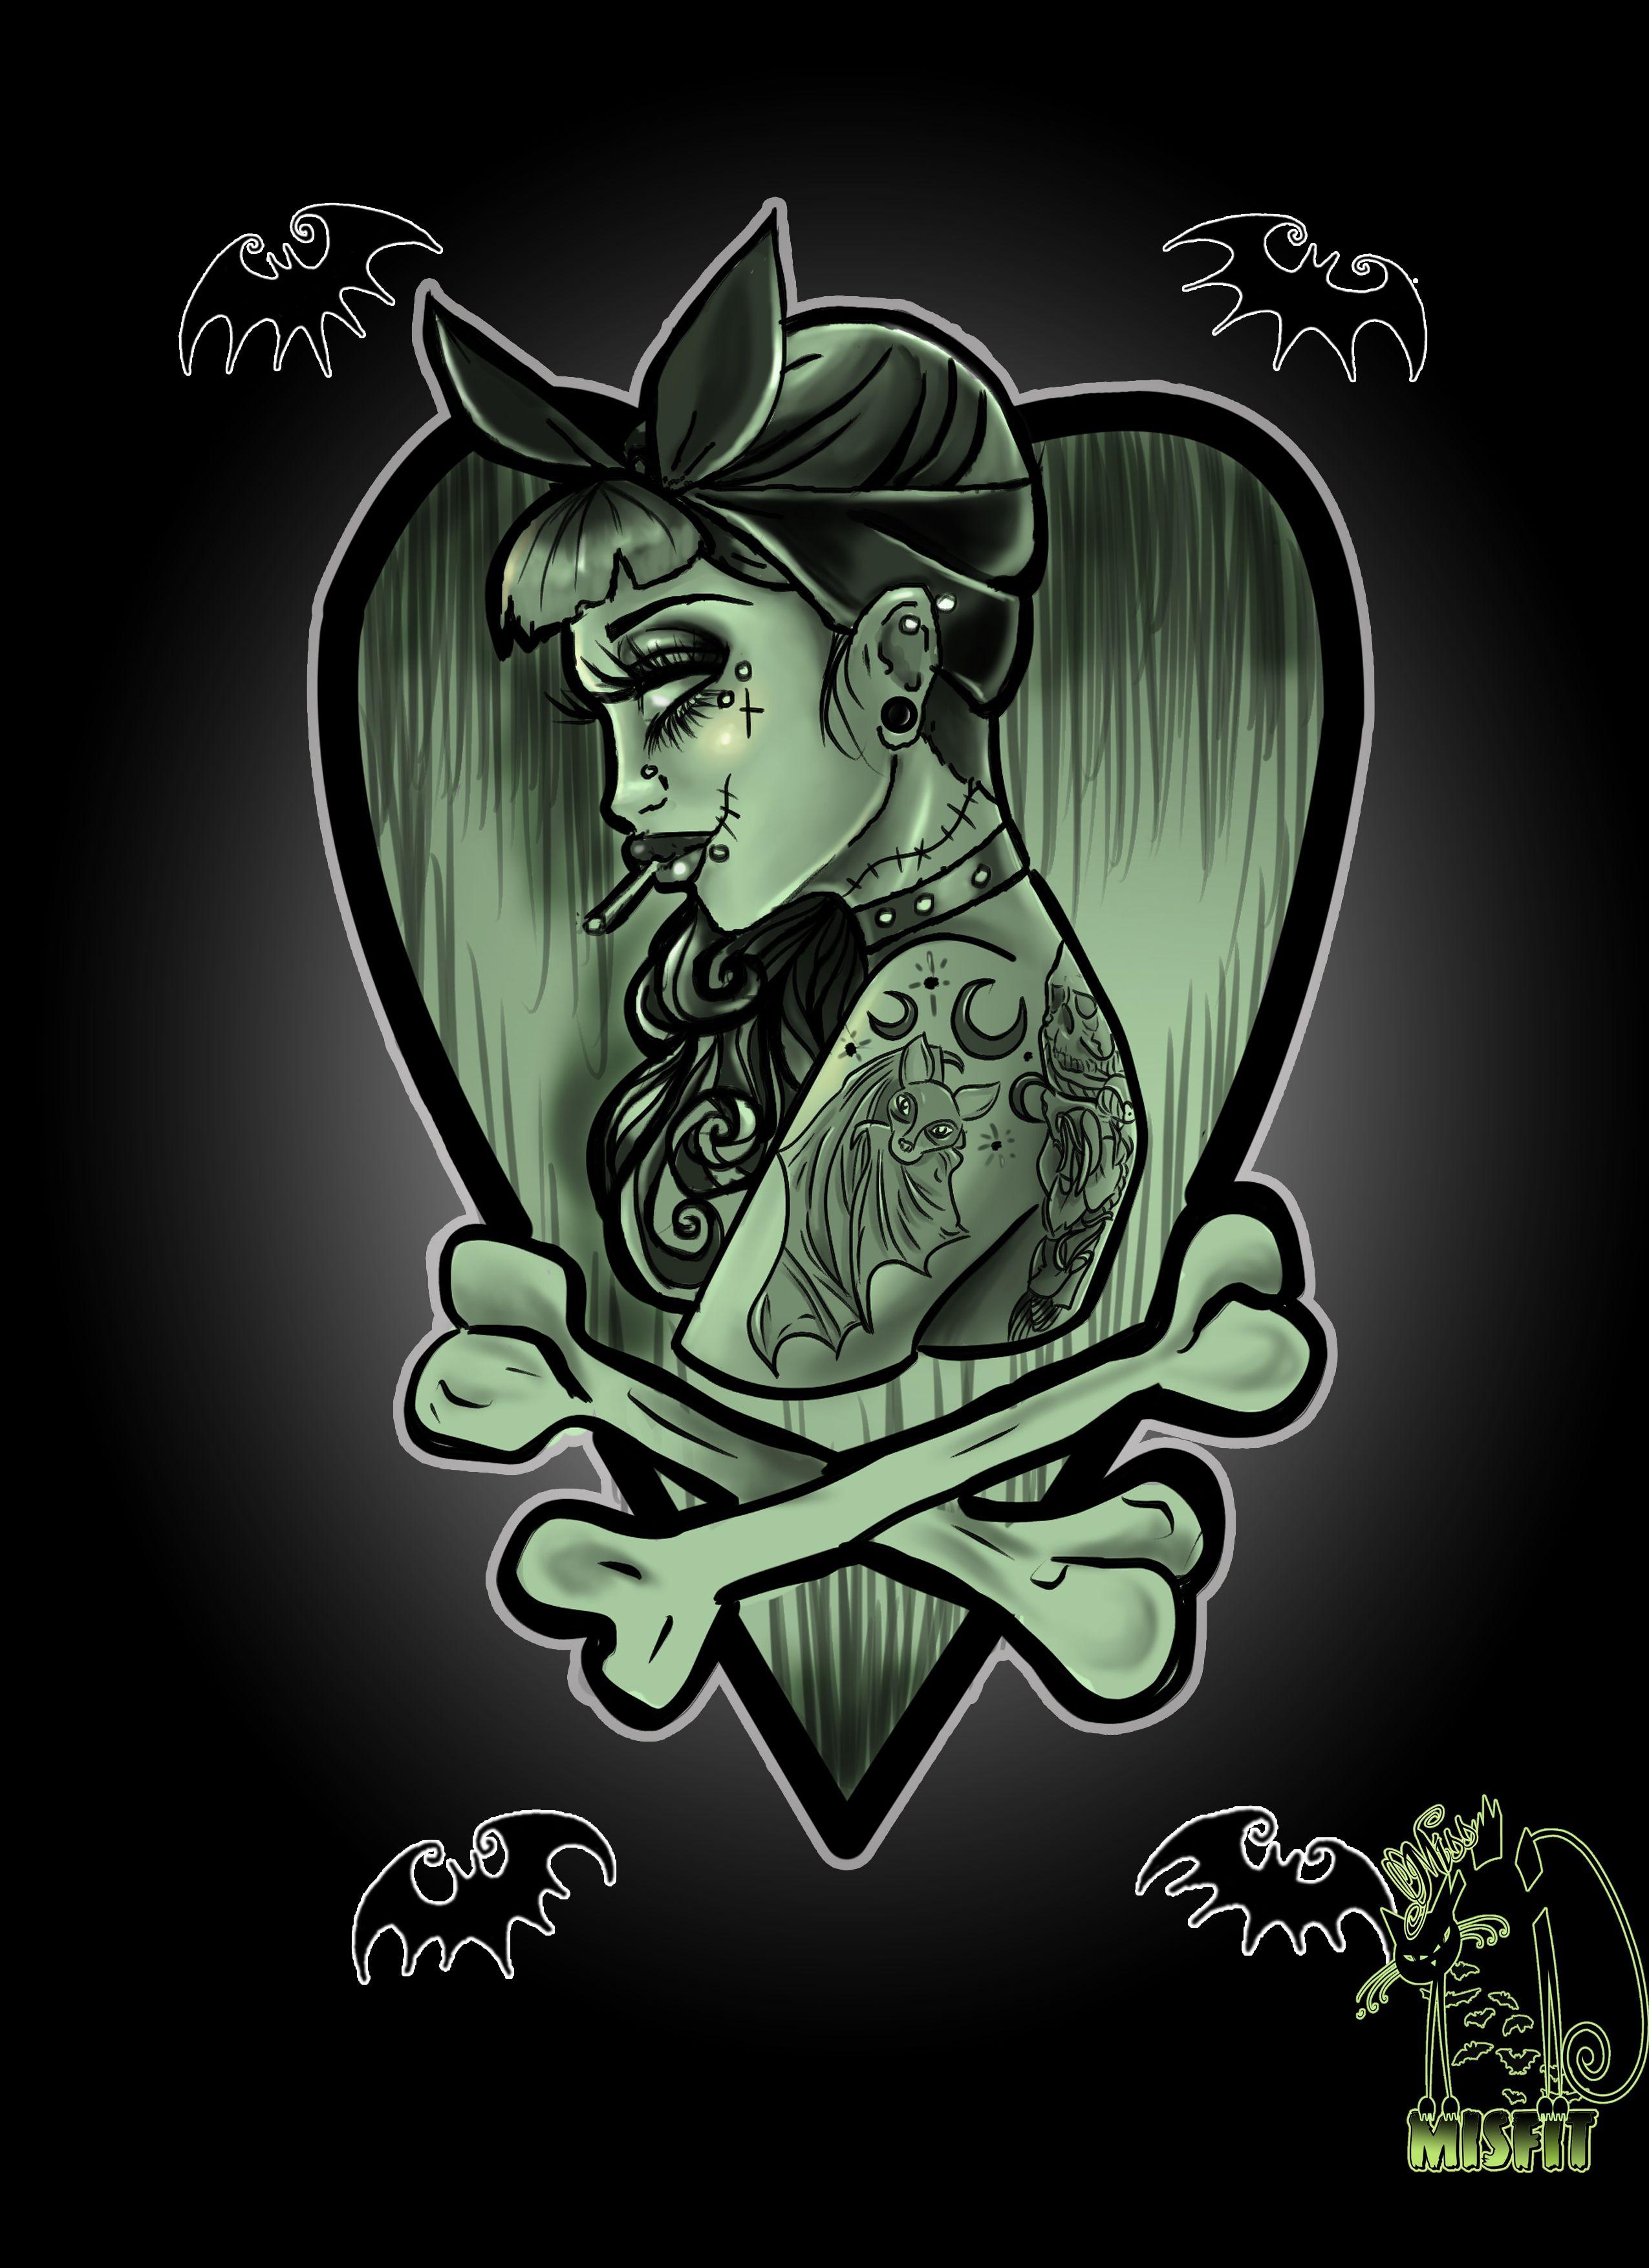 d9101e1b9 Zombie tattoo girl | ZOMBIE NATION | Zombie tattoos, Zombie girl ...